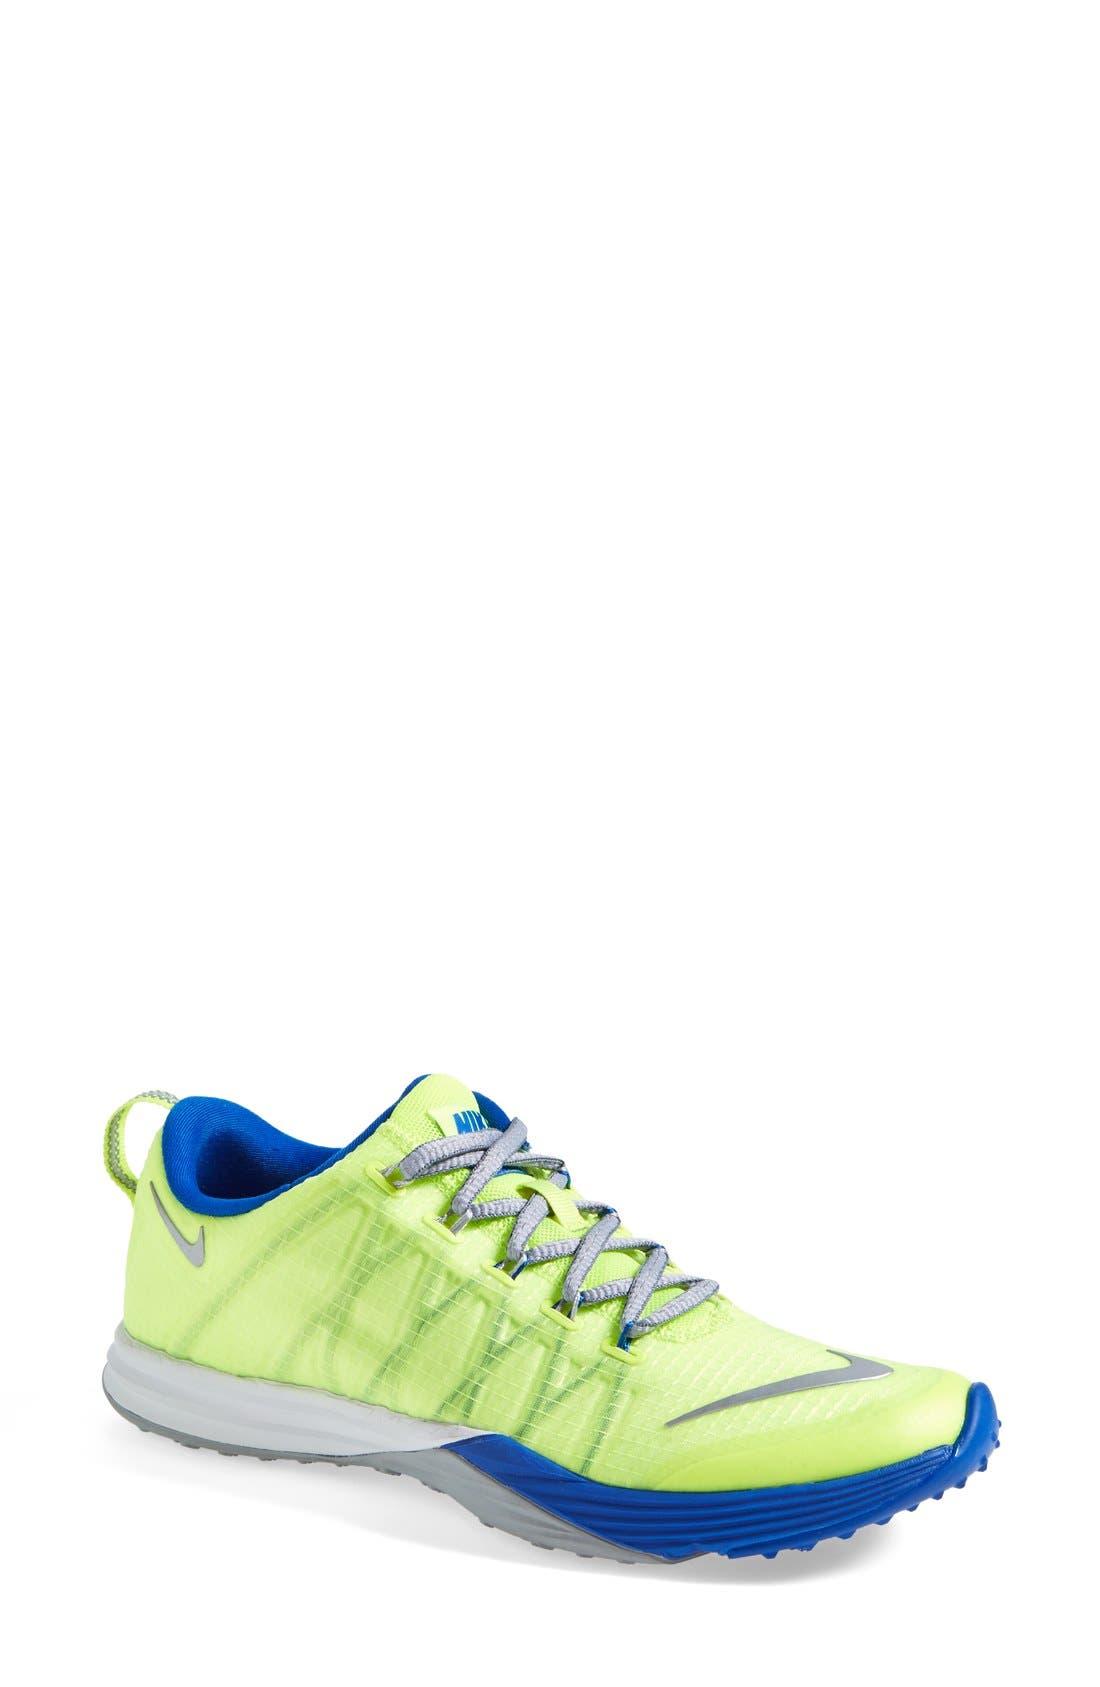 Alternate Image 1 Selected - Nike 'Lunar Cross Element' Training Shoe (Women)